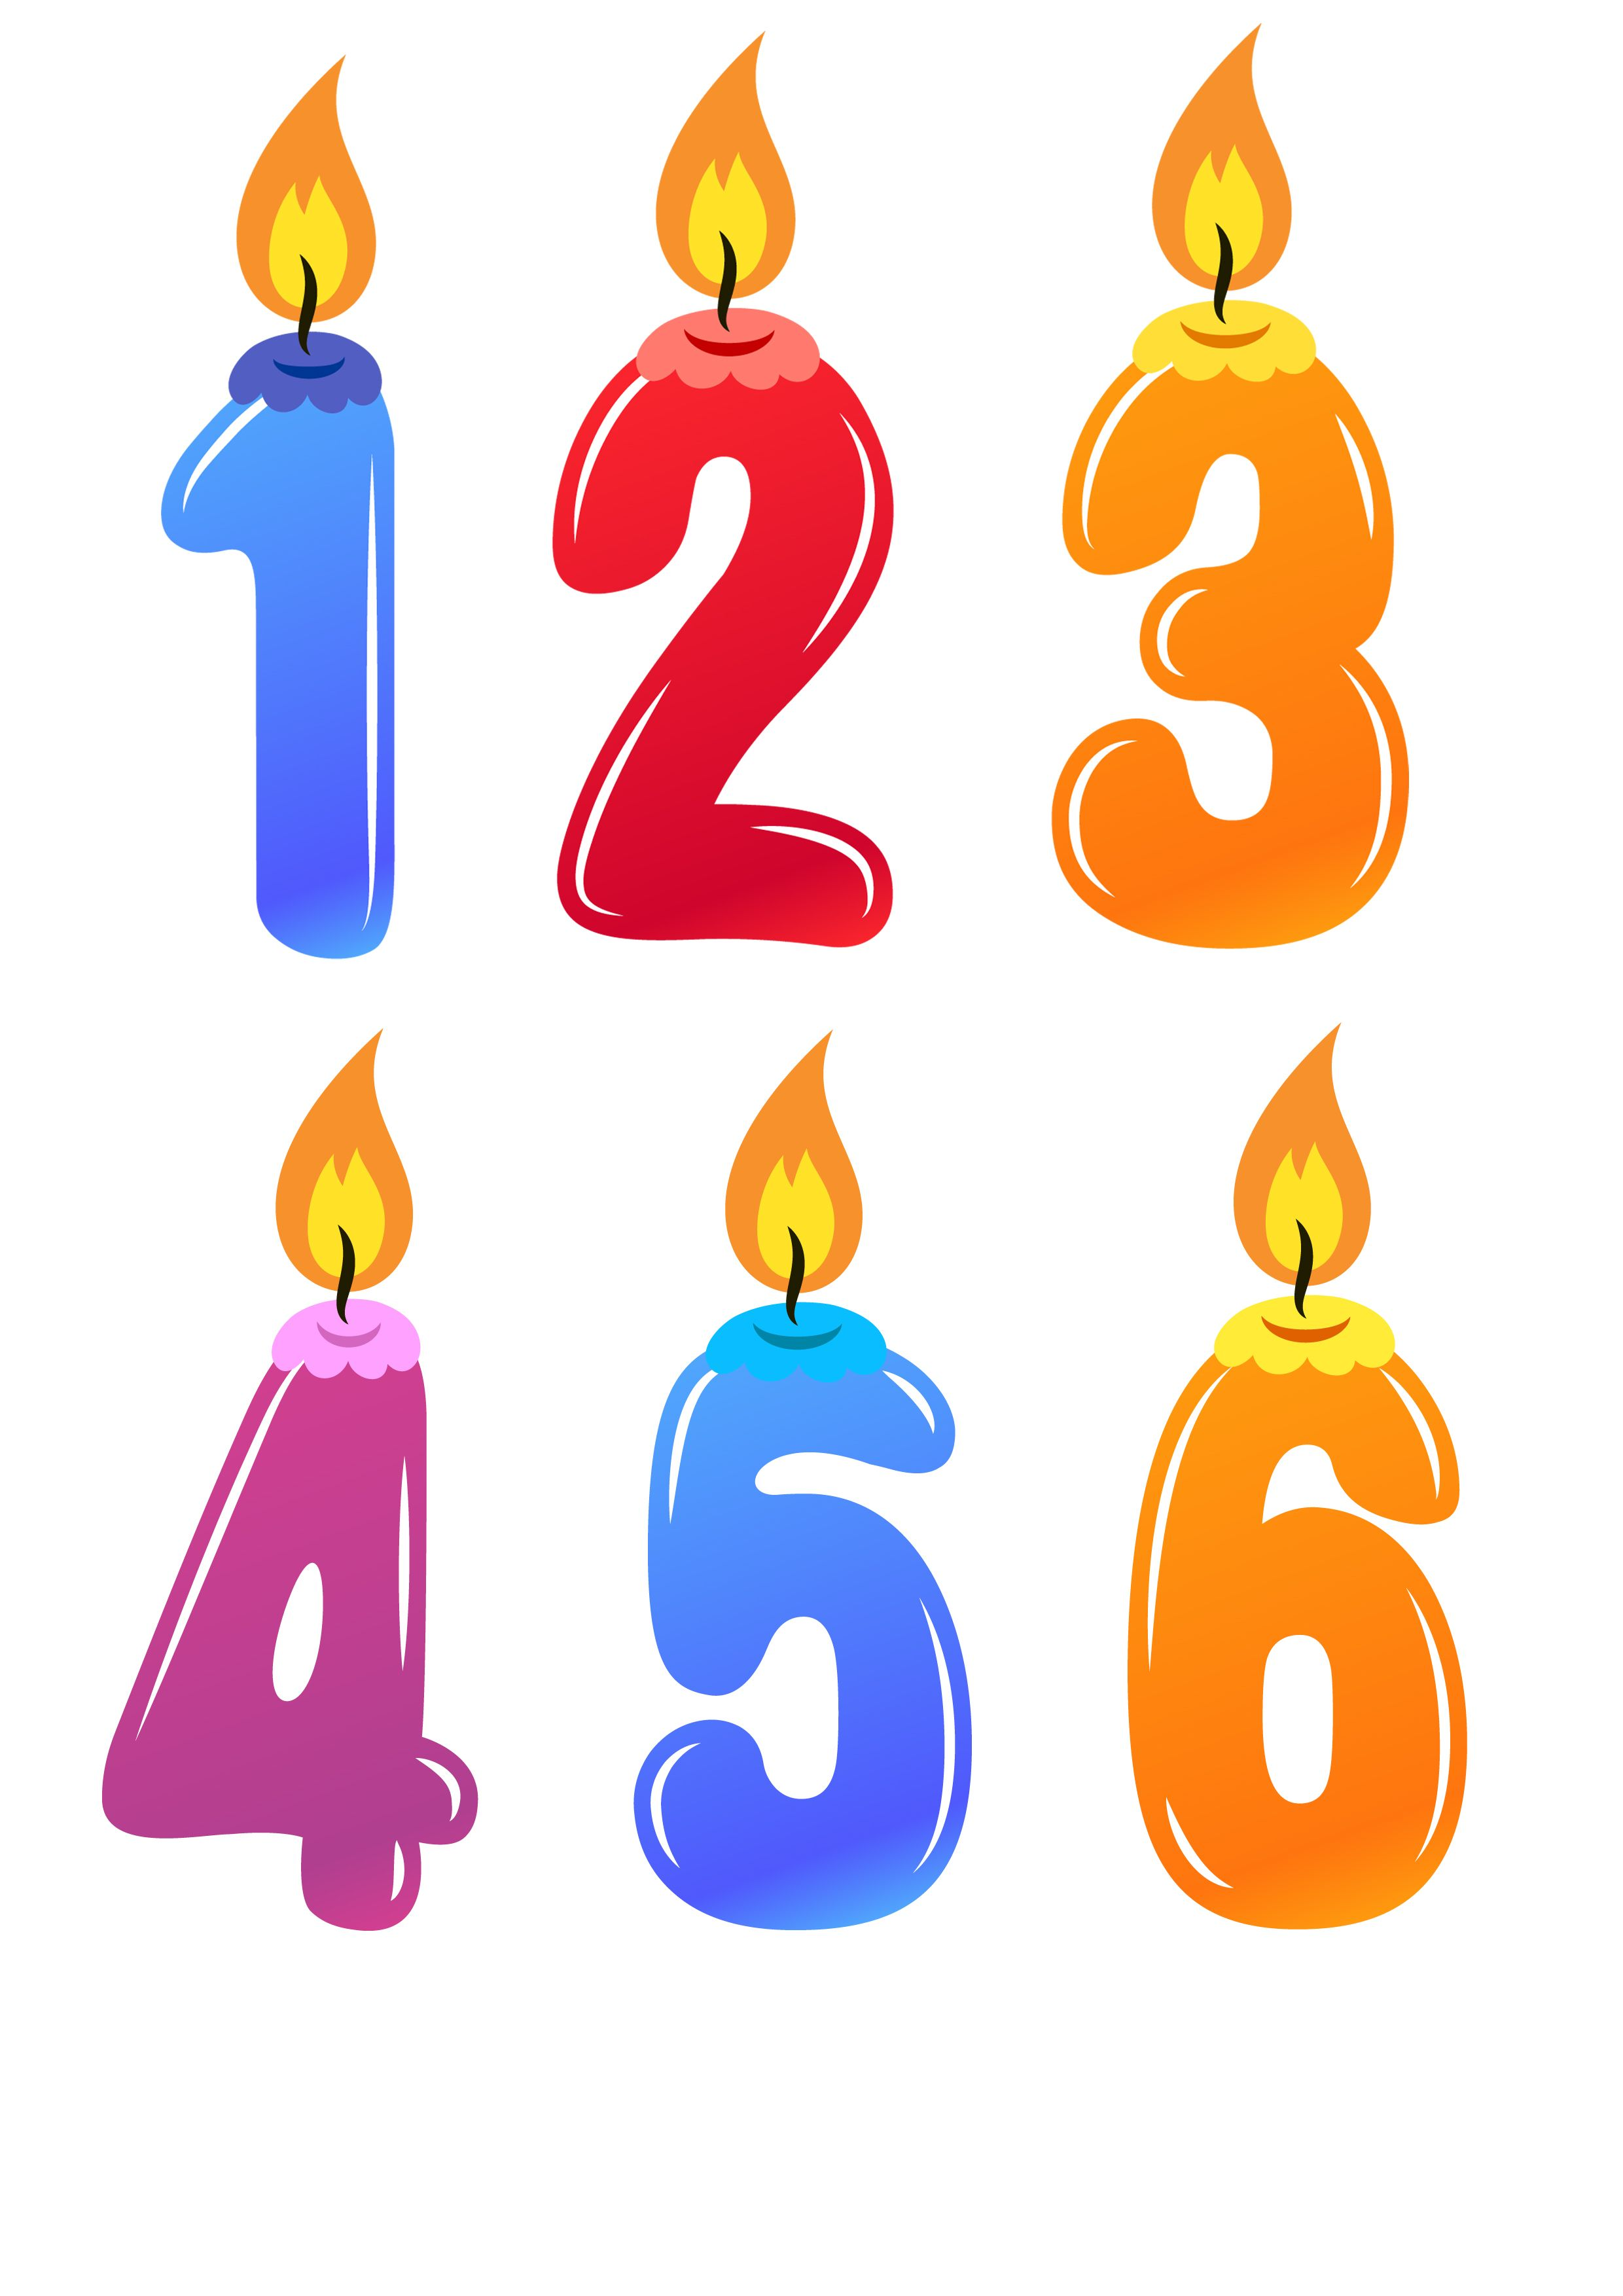 Pin de beatriz samblas en CARTELES | Pinterest | Números, Cumpleaños ...